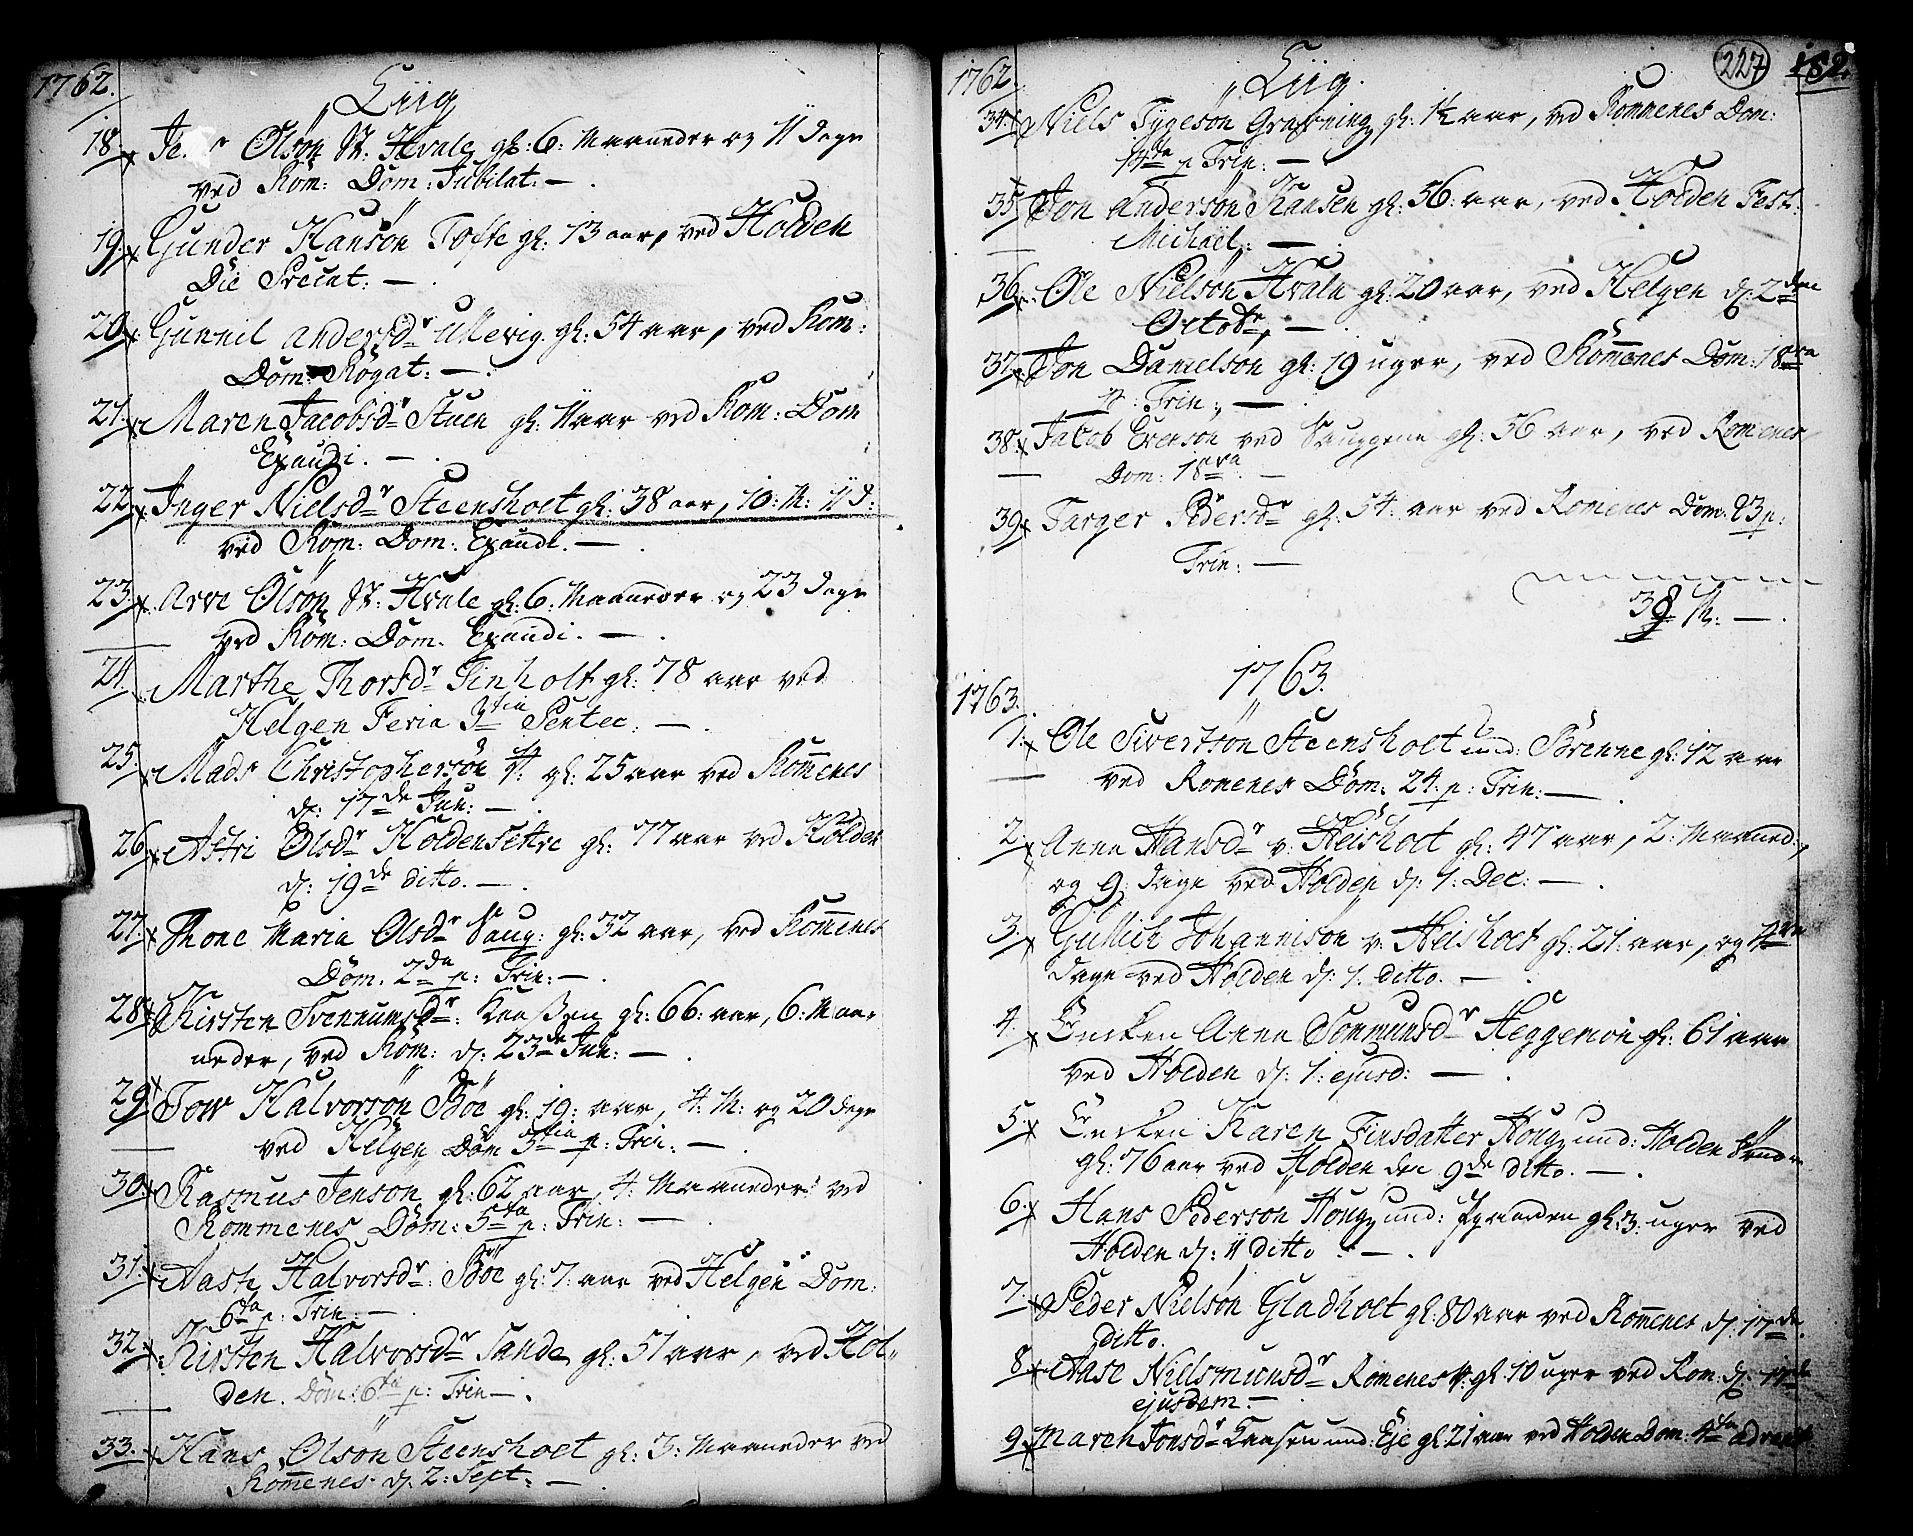 SAKO, Holla kirkebøker, F/Fa/L0001: Ministerialbok nr. 1, 1717-1779, s. 227